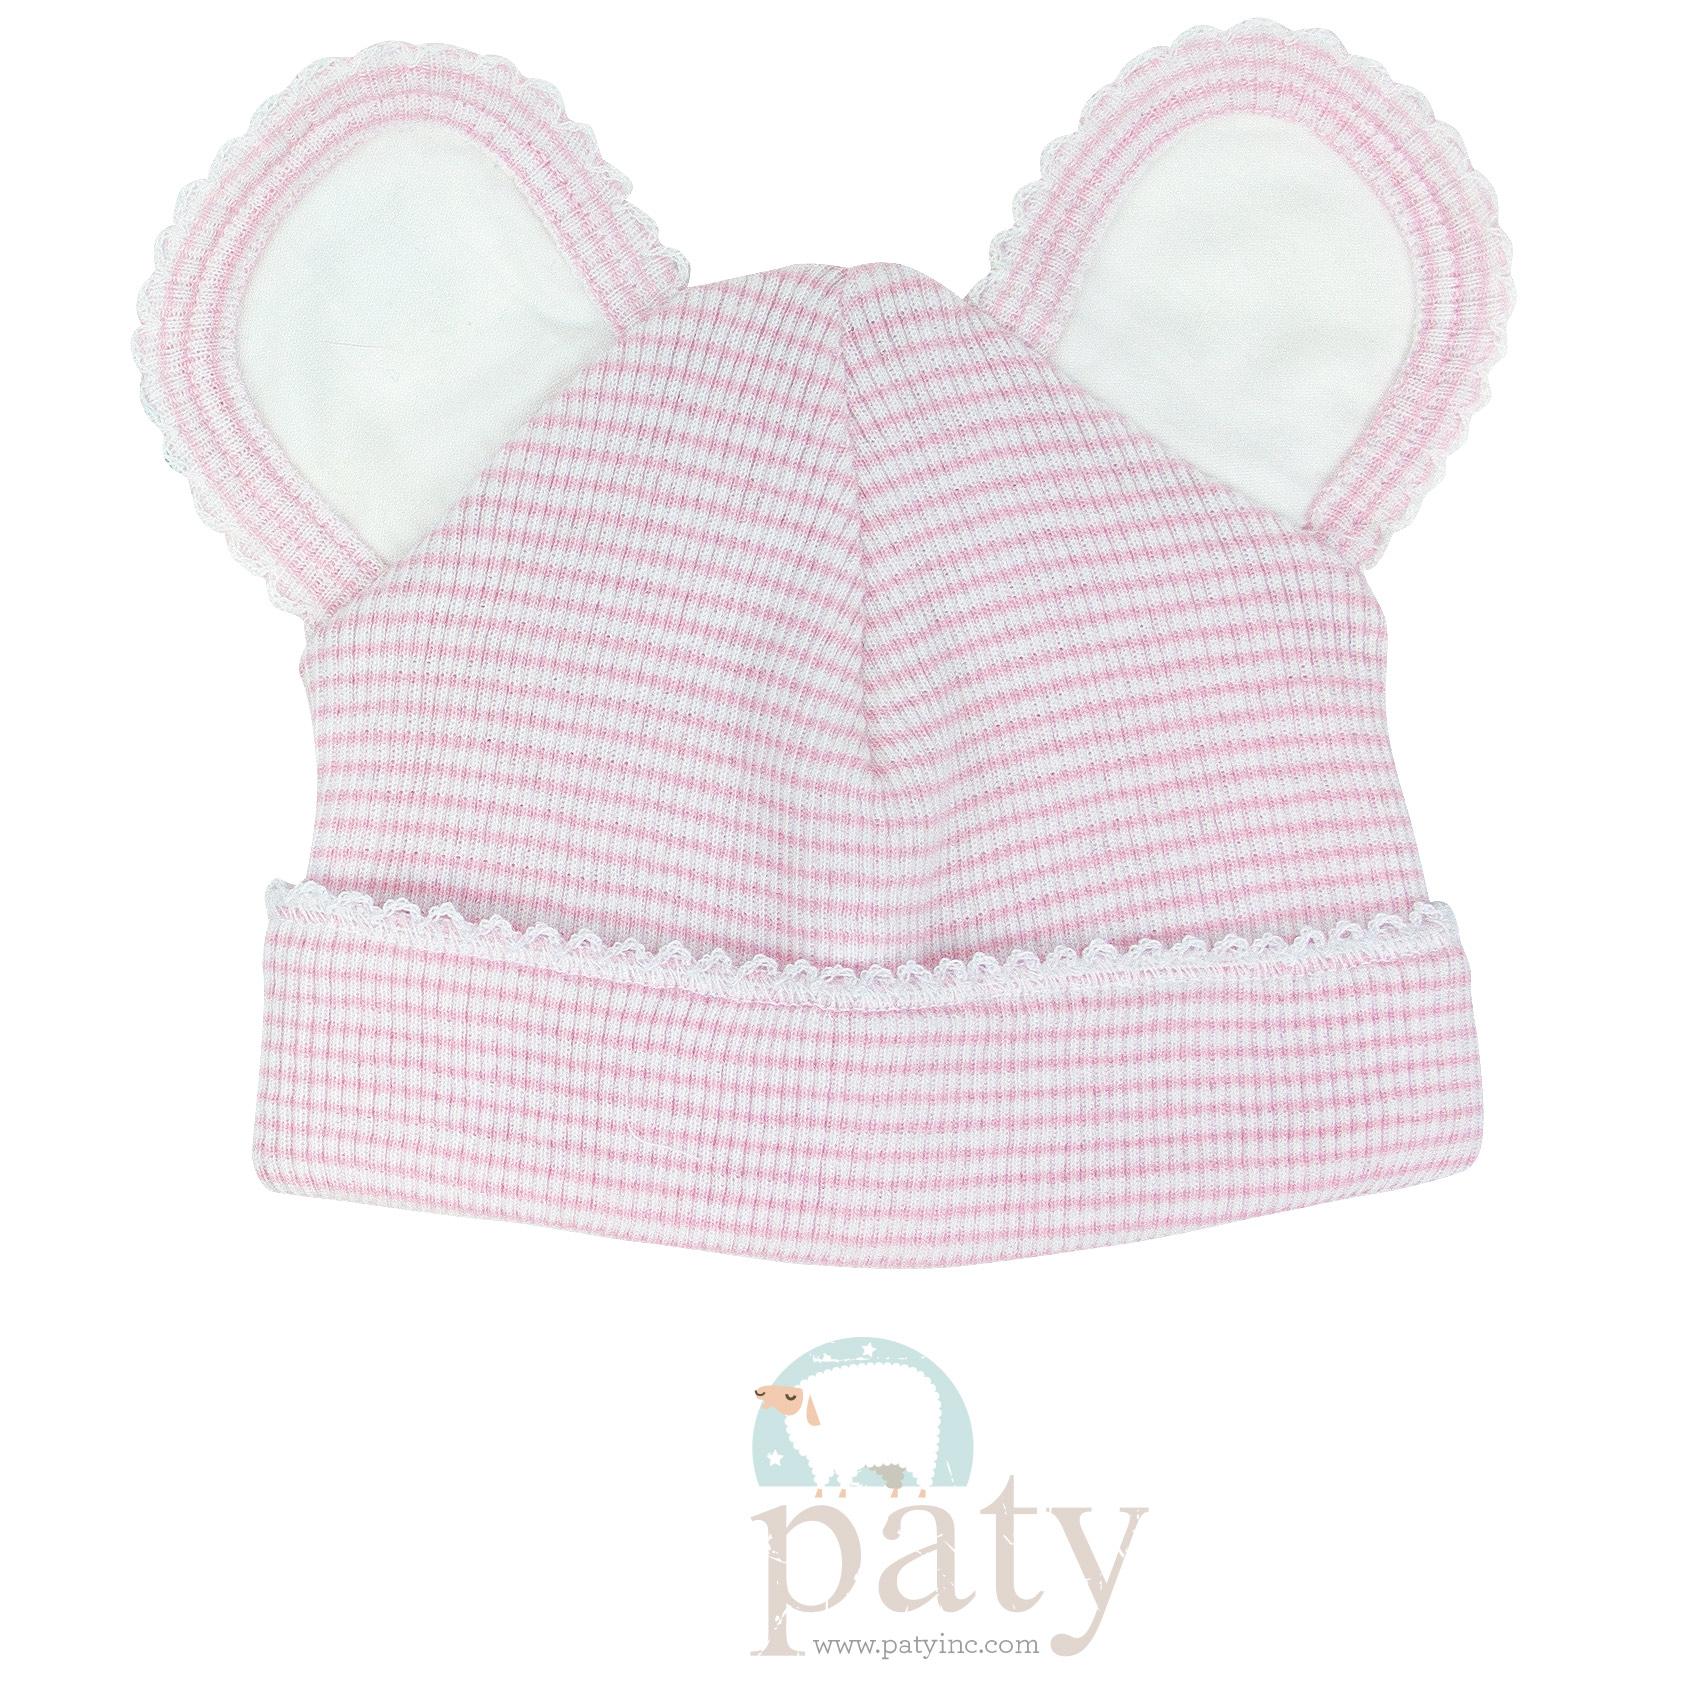 Paty Rib Knit Pink with White Trim Bear Cap